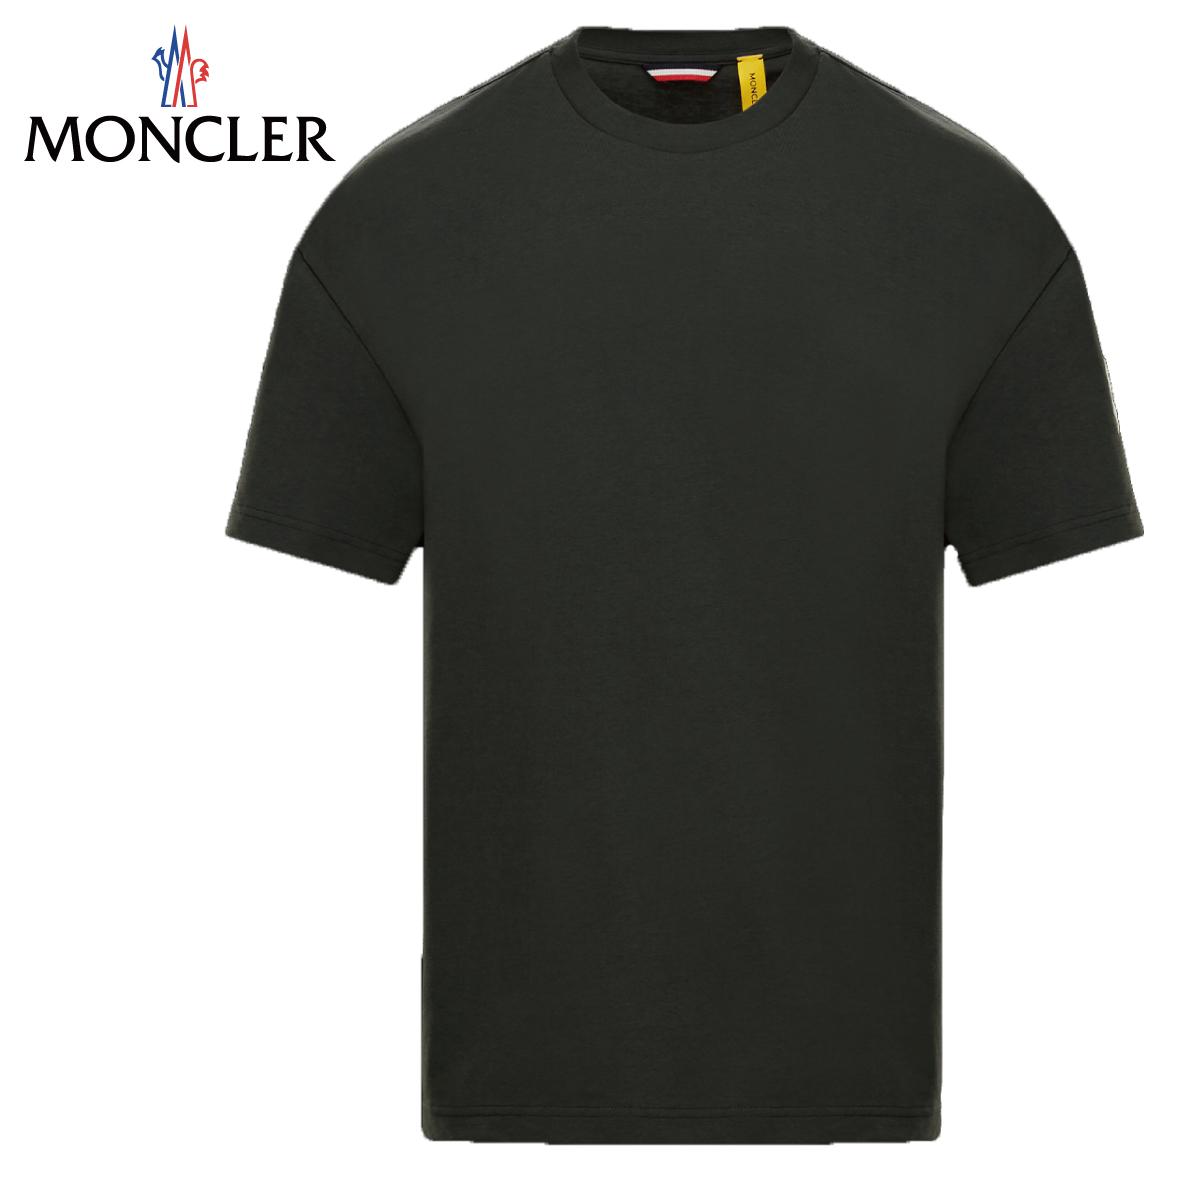 MONCLER 2 MONCLER 1952 T-SHIRT 2020SS モンクレール ブラック メンズ Tシャツ 2020年春夏新作